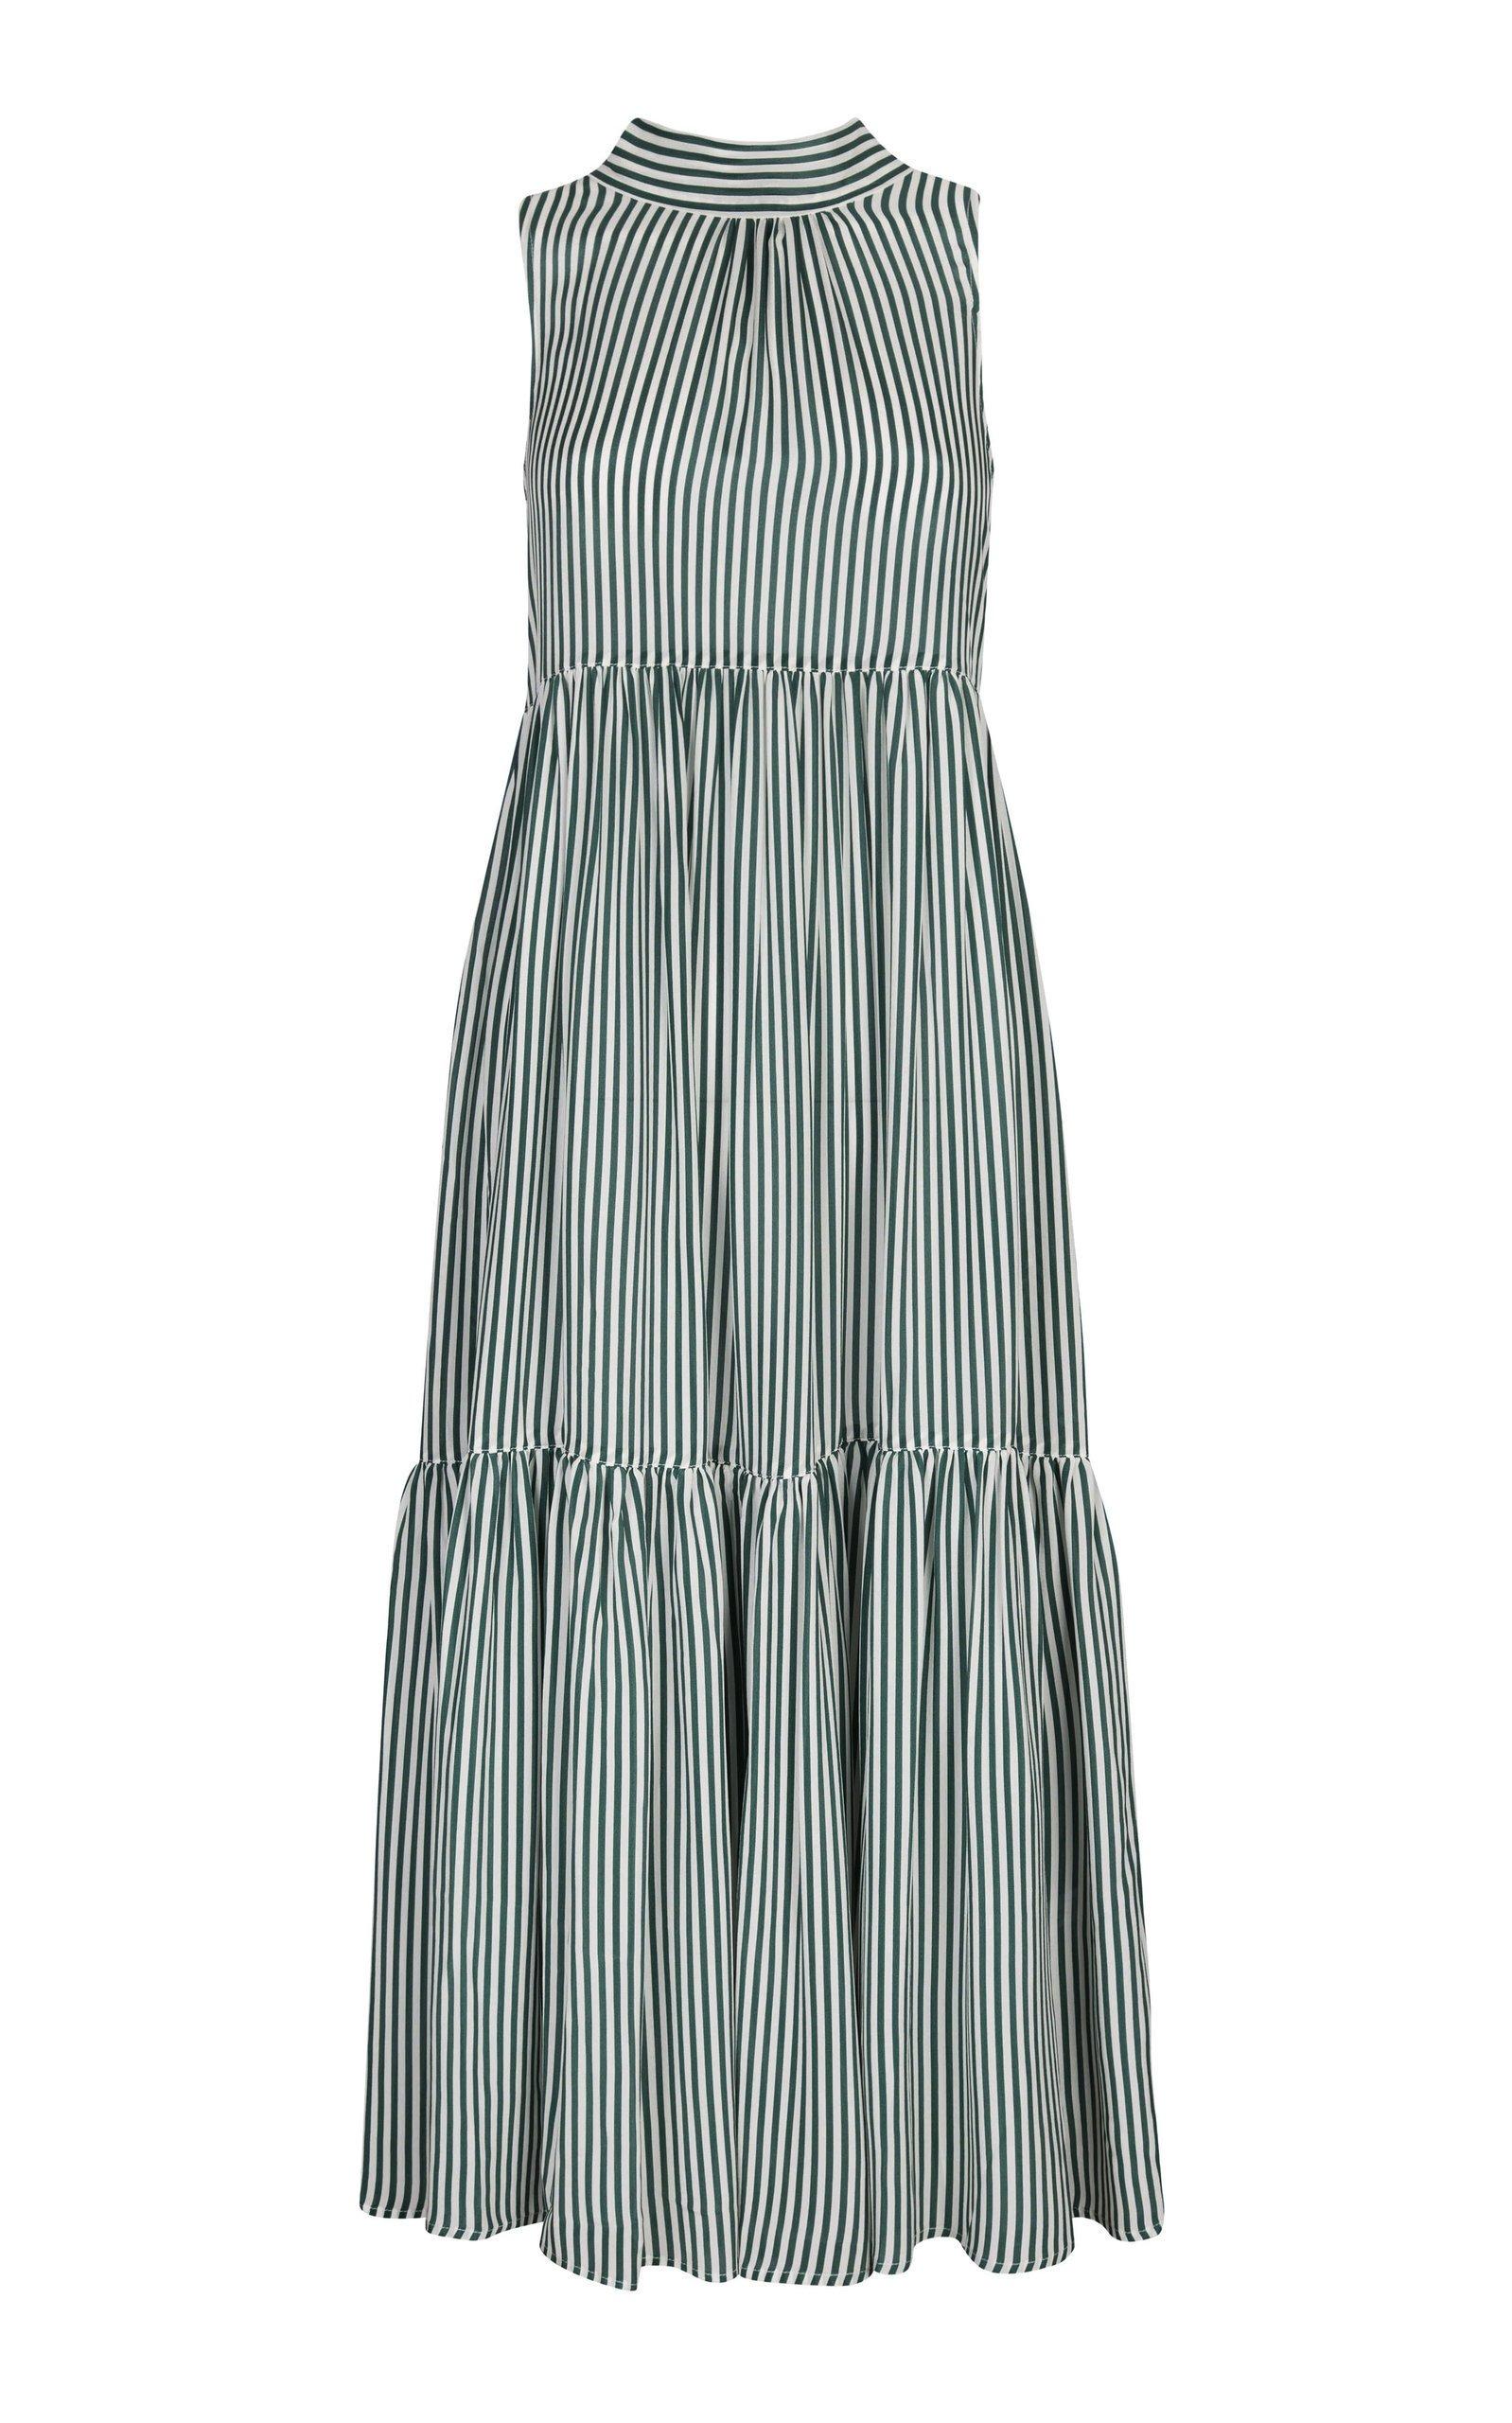 Asceno Printed Midi Dress